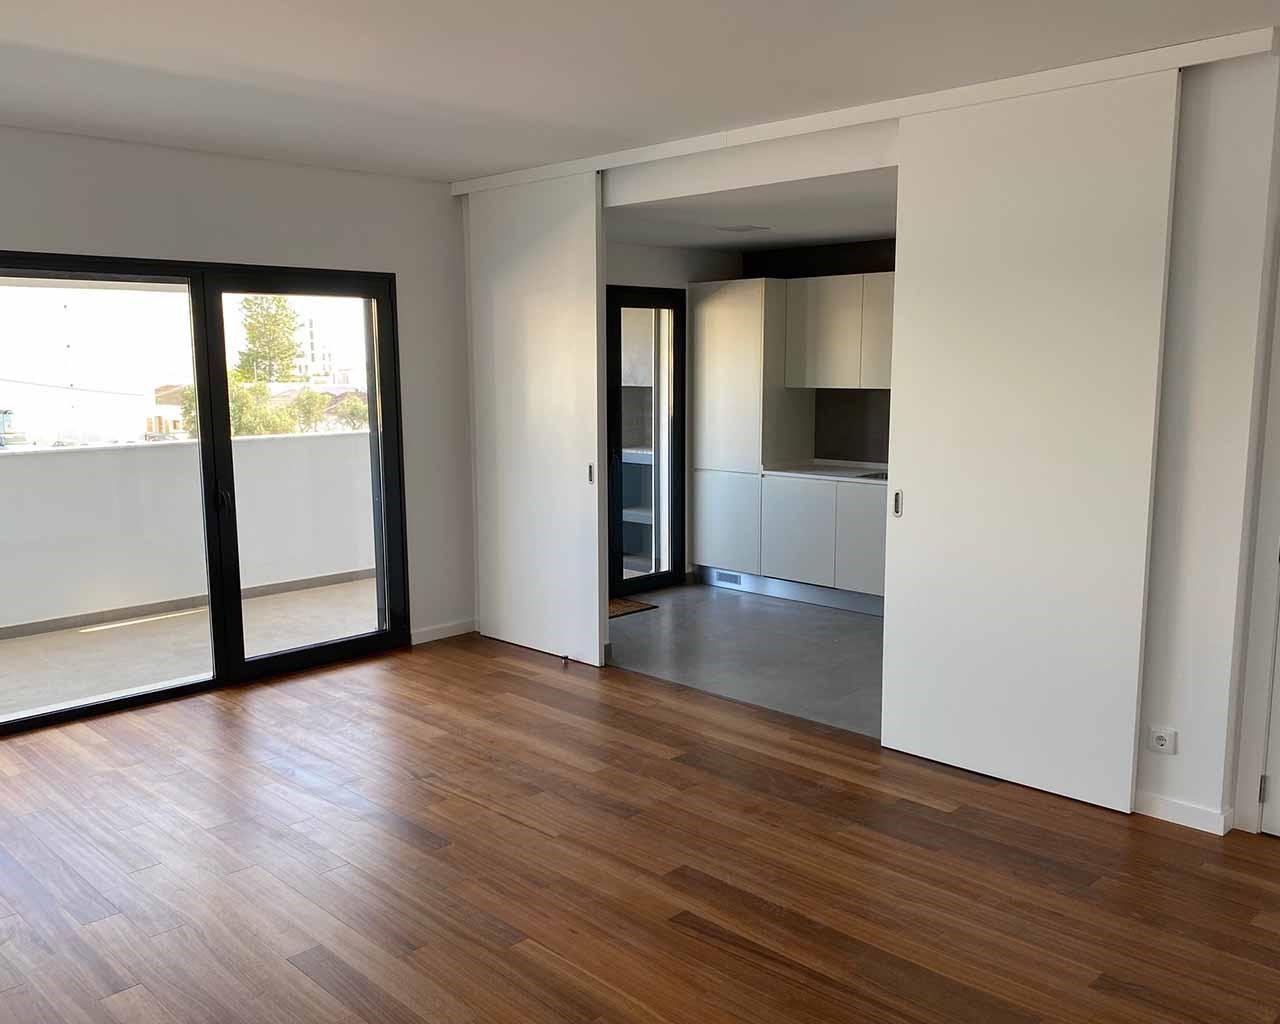 Faro-Lux_Terrace - Living room+kitchen